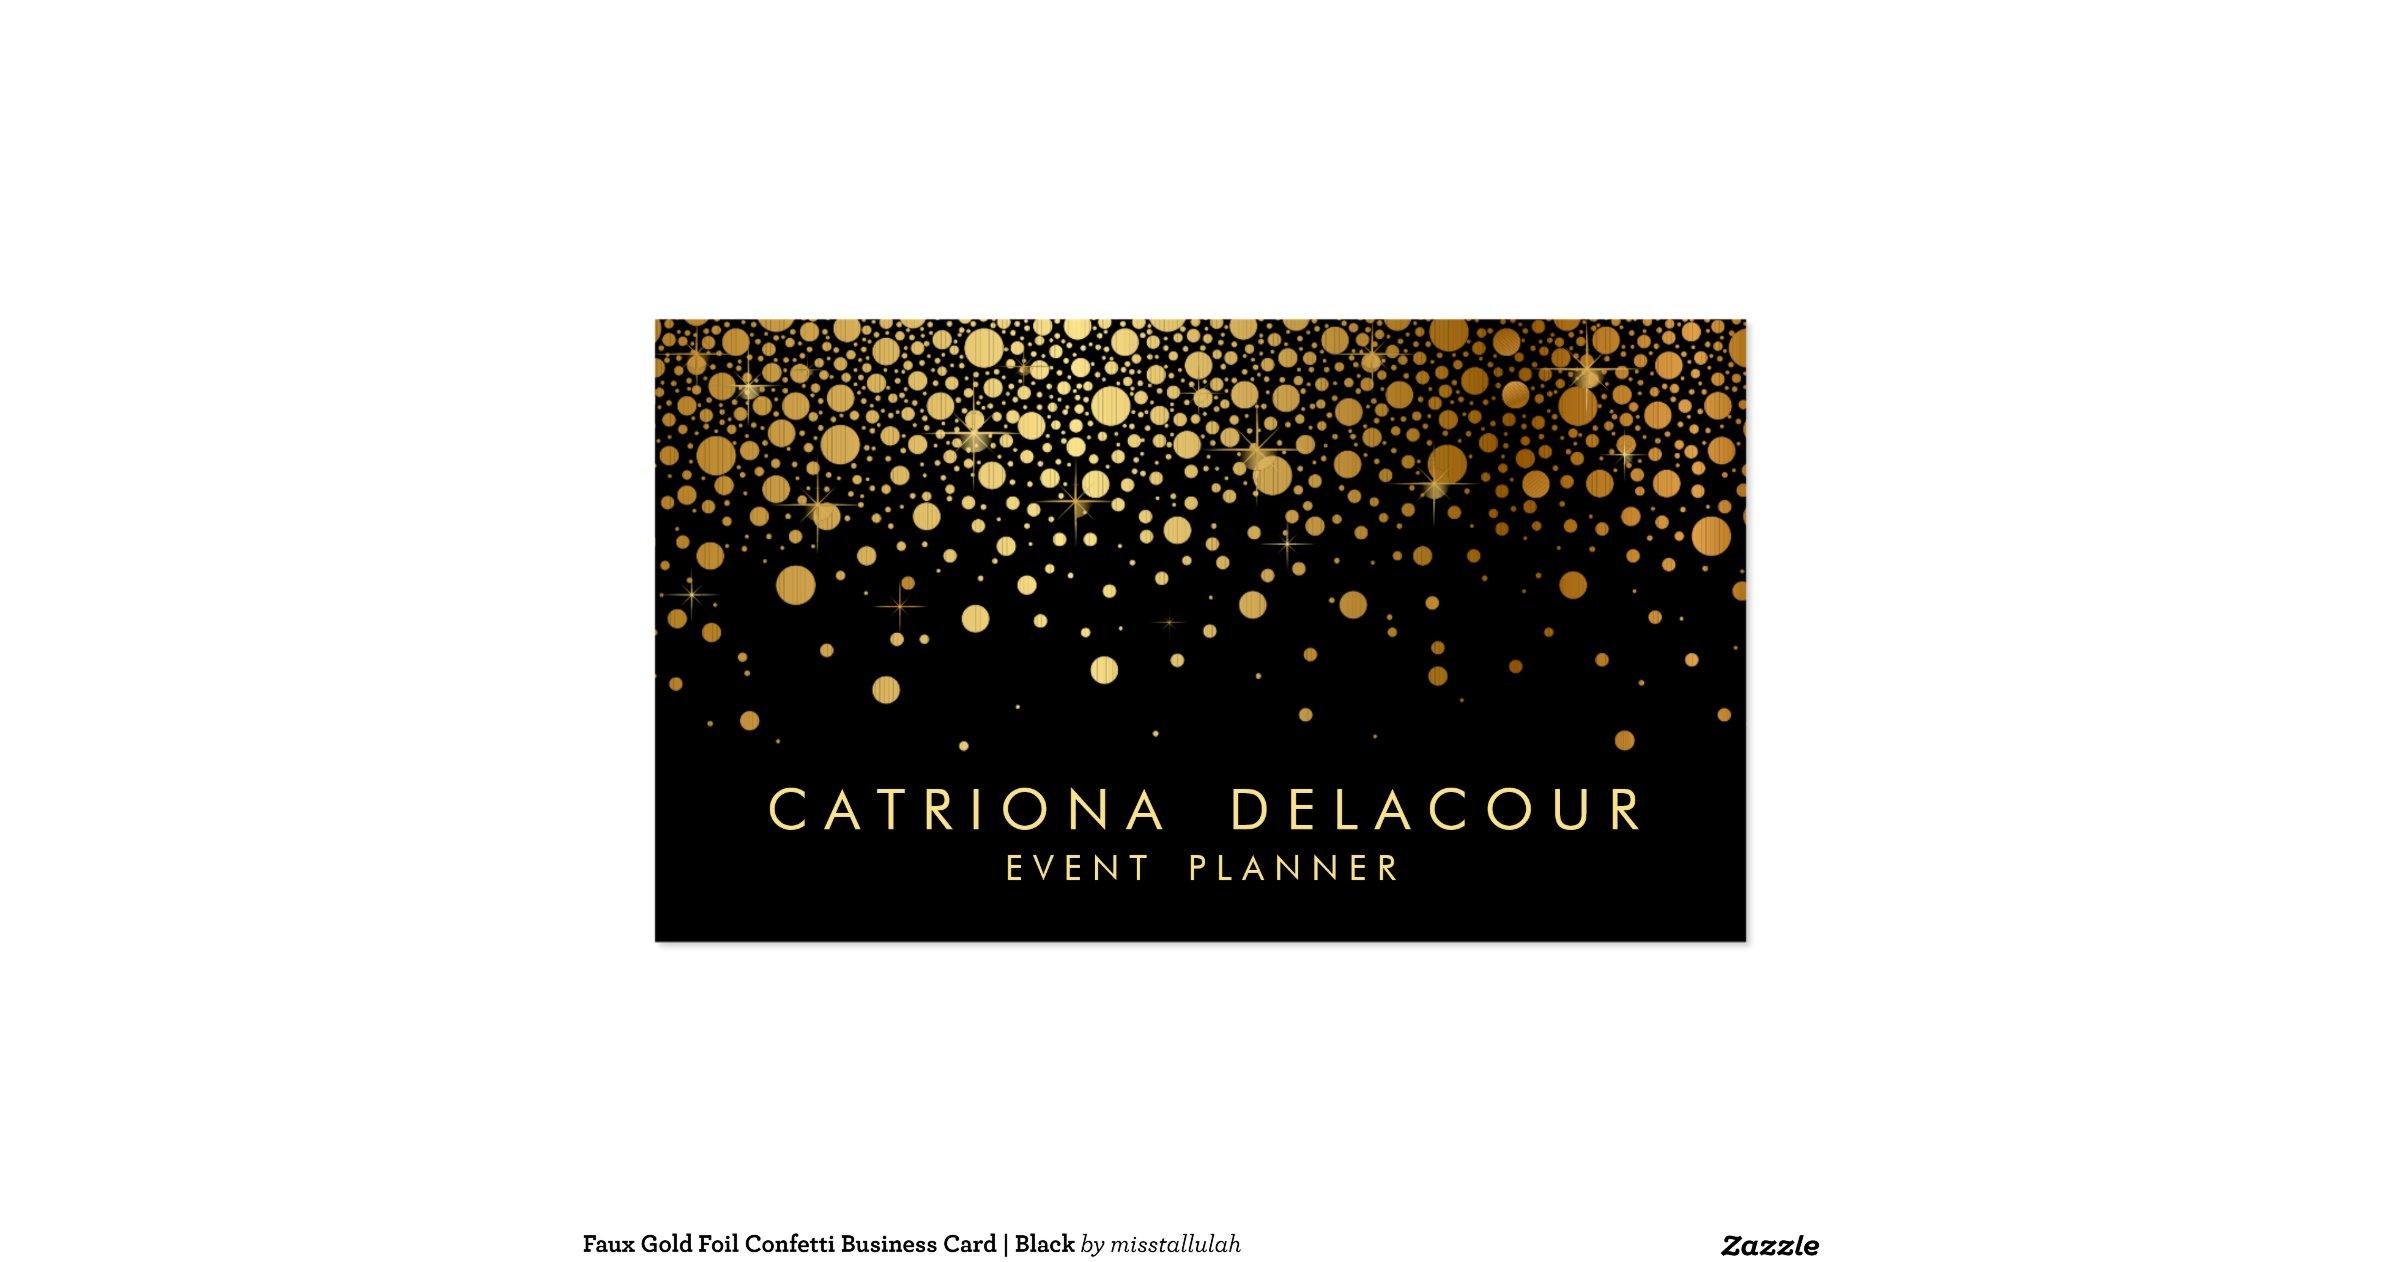 faux gold foil confetti business card black